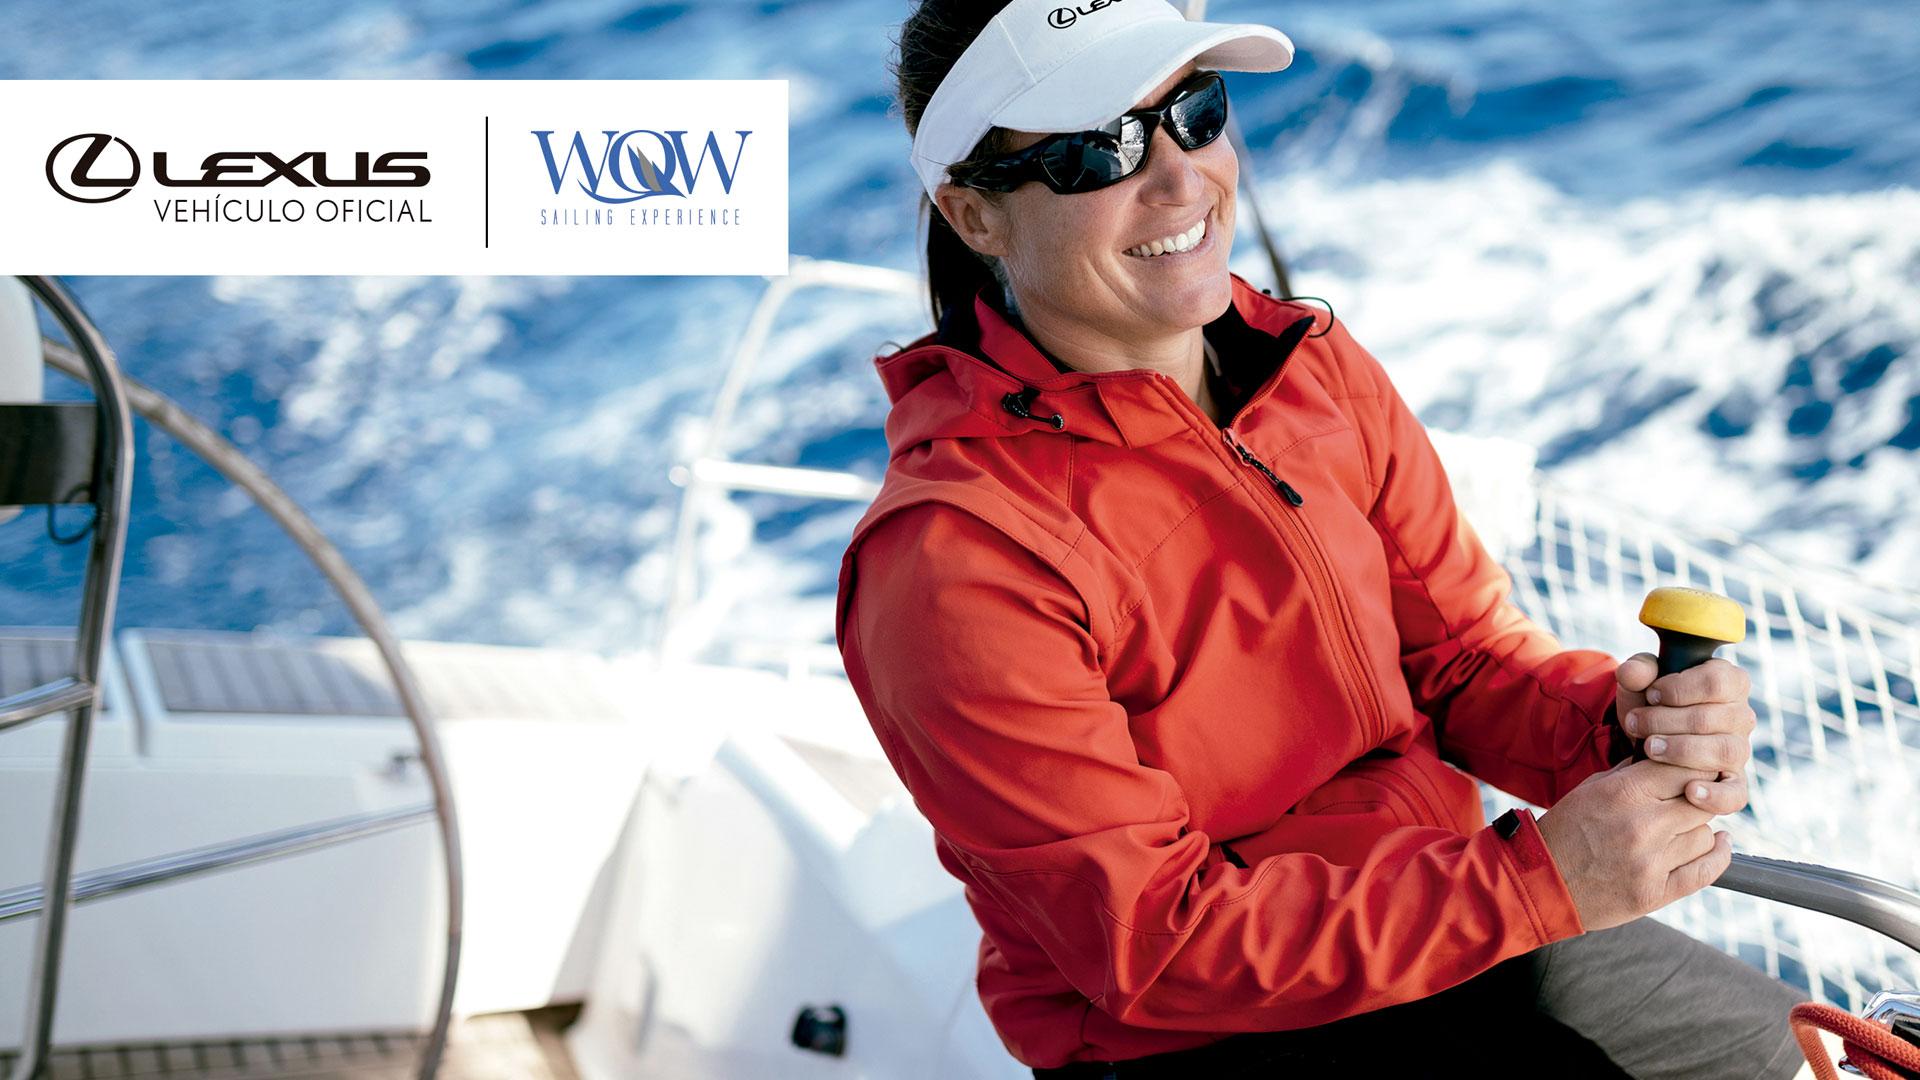 wow sailing challenge hero asset